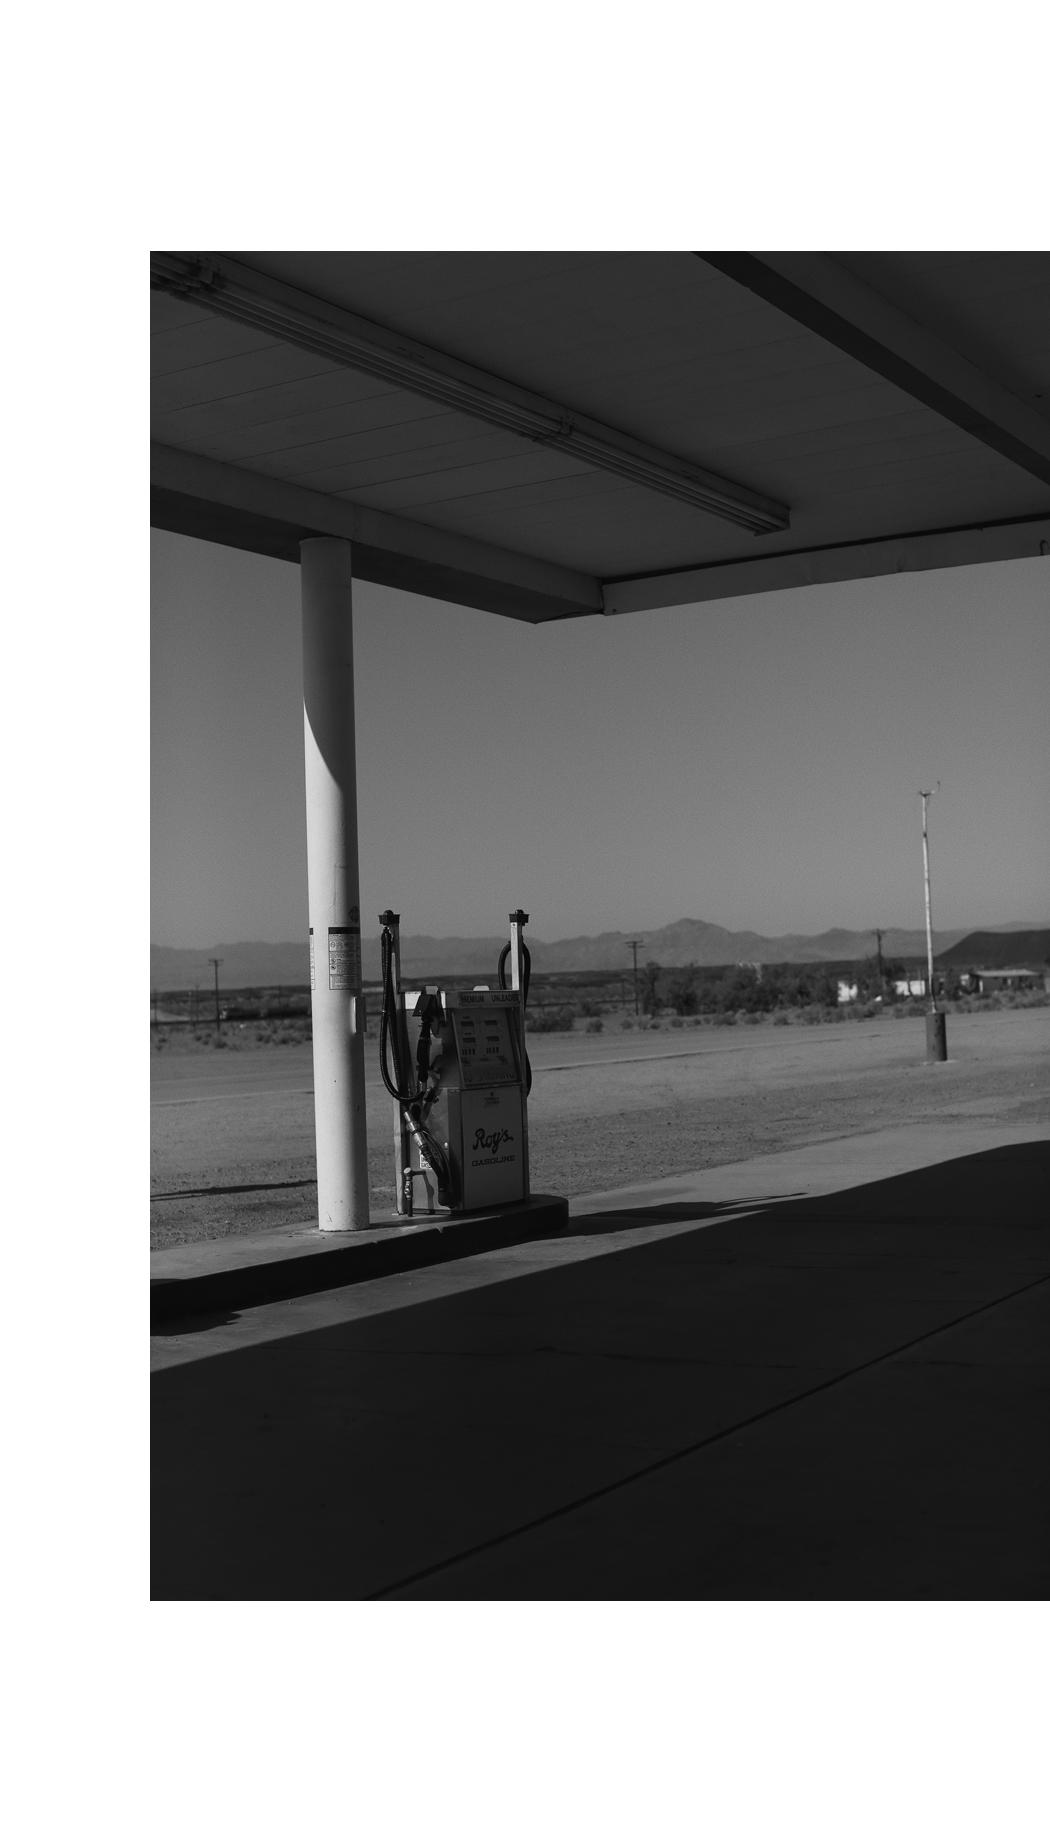 MOJAVE DESERT - Amboy, CALIFORNIA - Fiona Dinkelbach